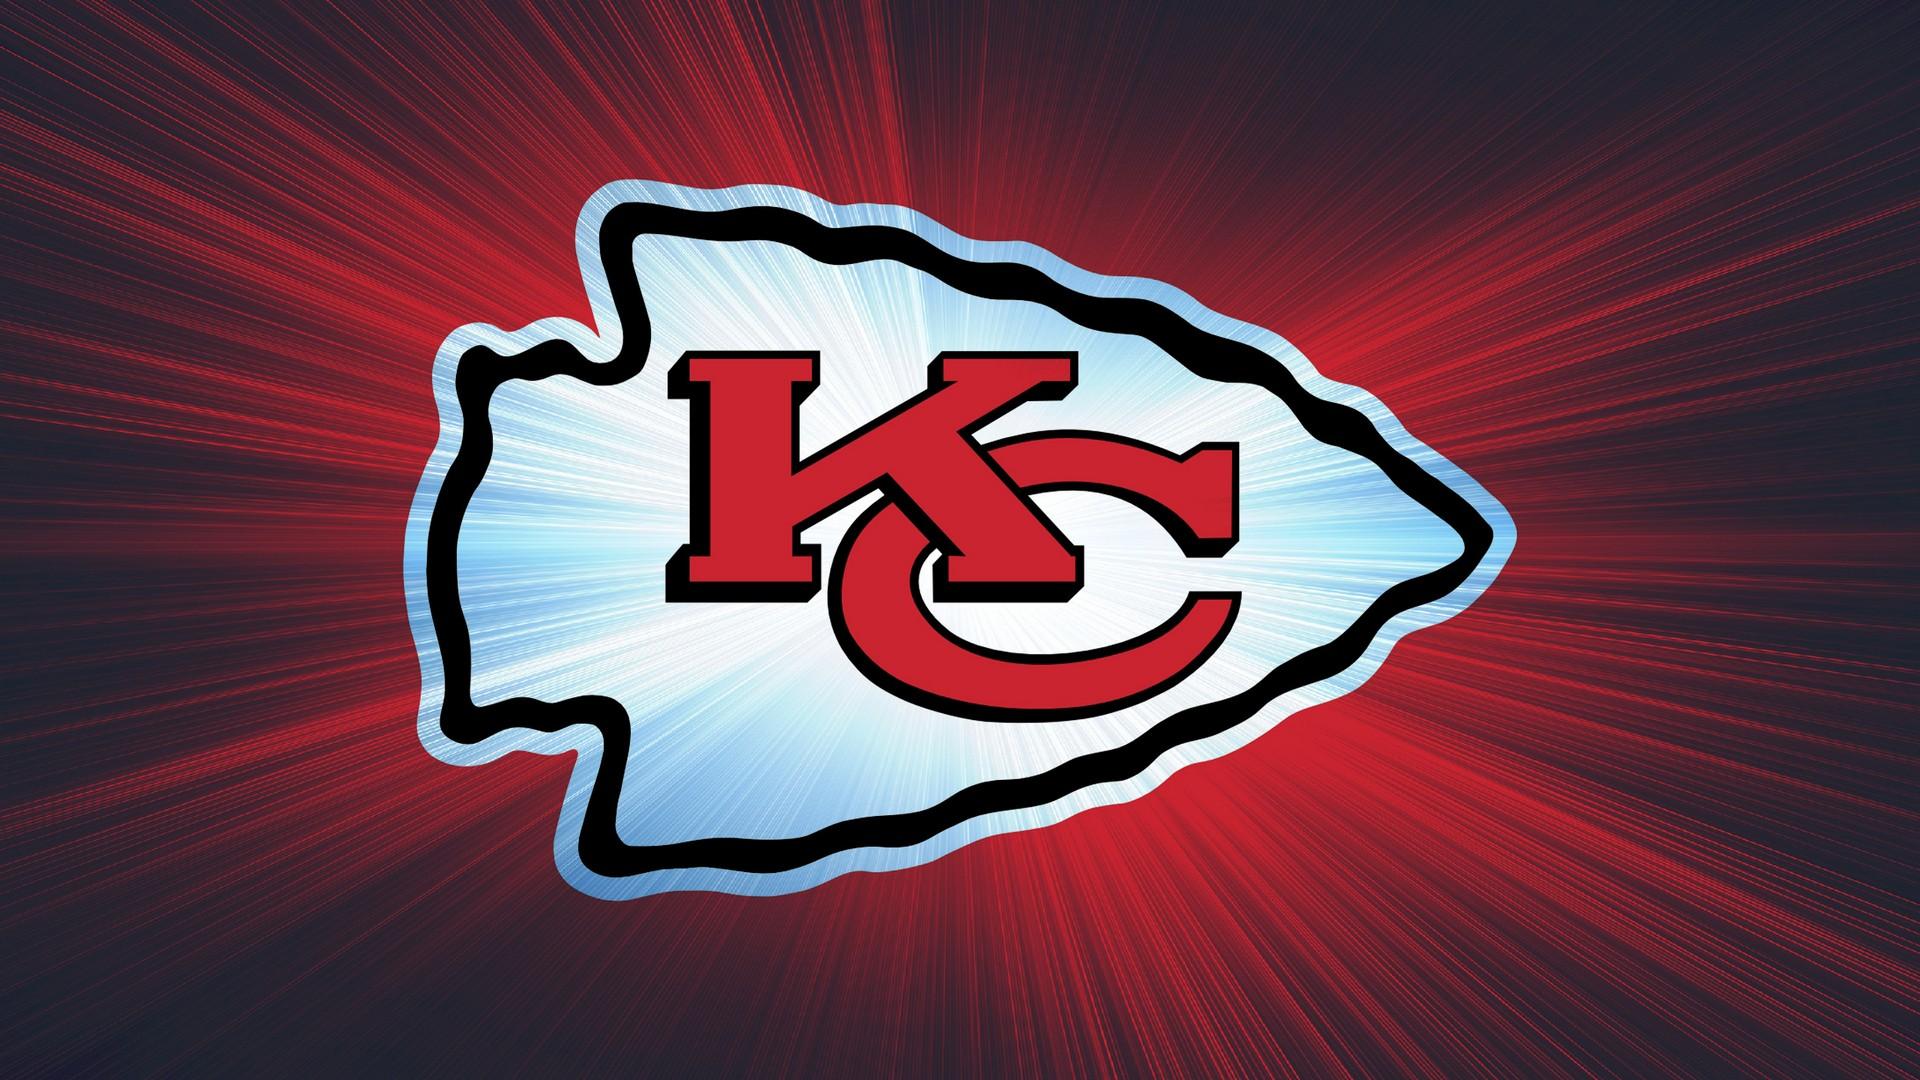 HD Kansas City Chiefs Wallpapers 2020 NFL Football Wallpapers 1920x1080